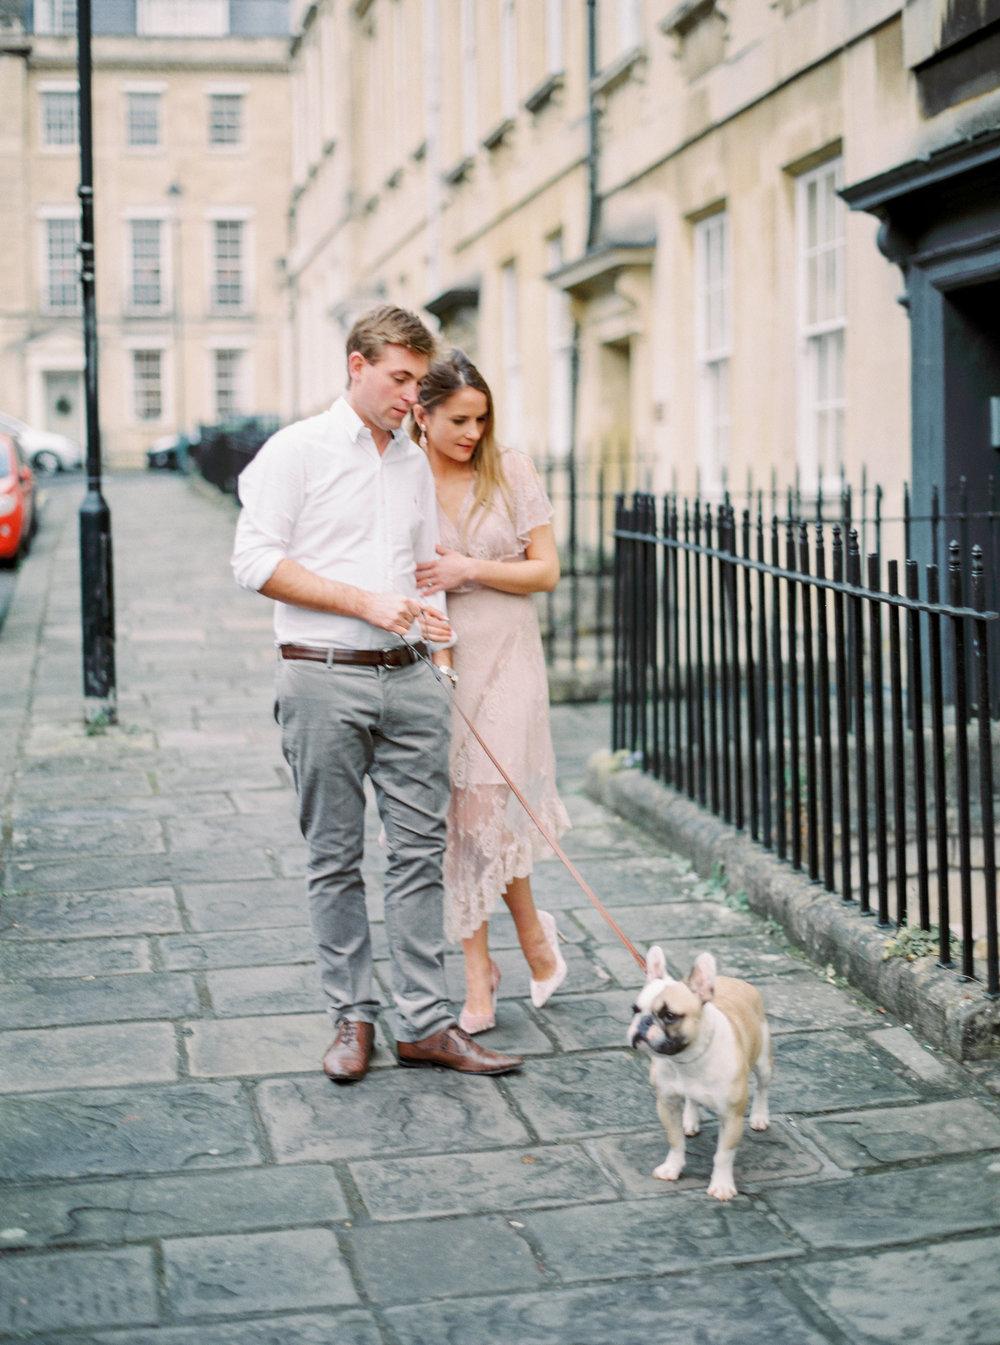 Luxury Wedding Planner UK | Our Chic & Romantic Engagement Shoot in Bath | Katie Julia Photography - 70.JPG